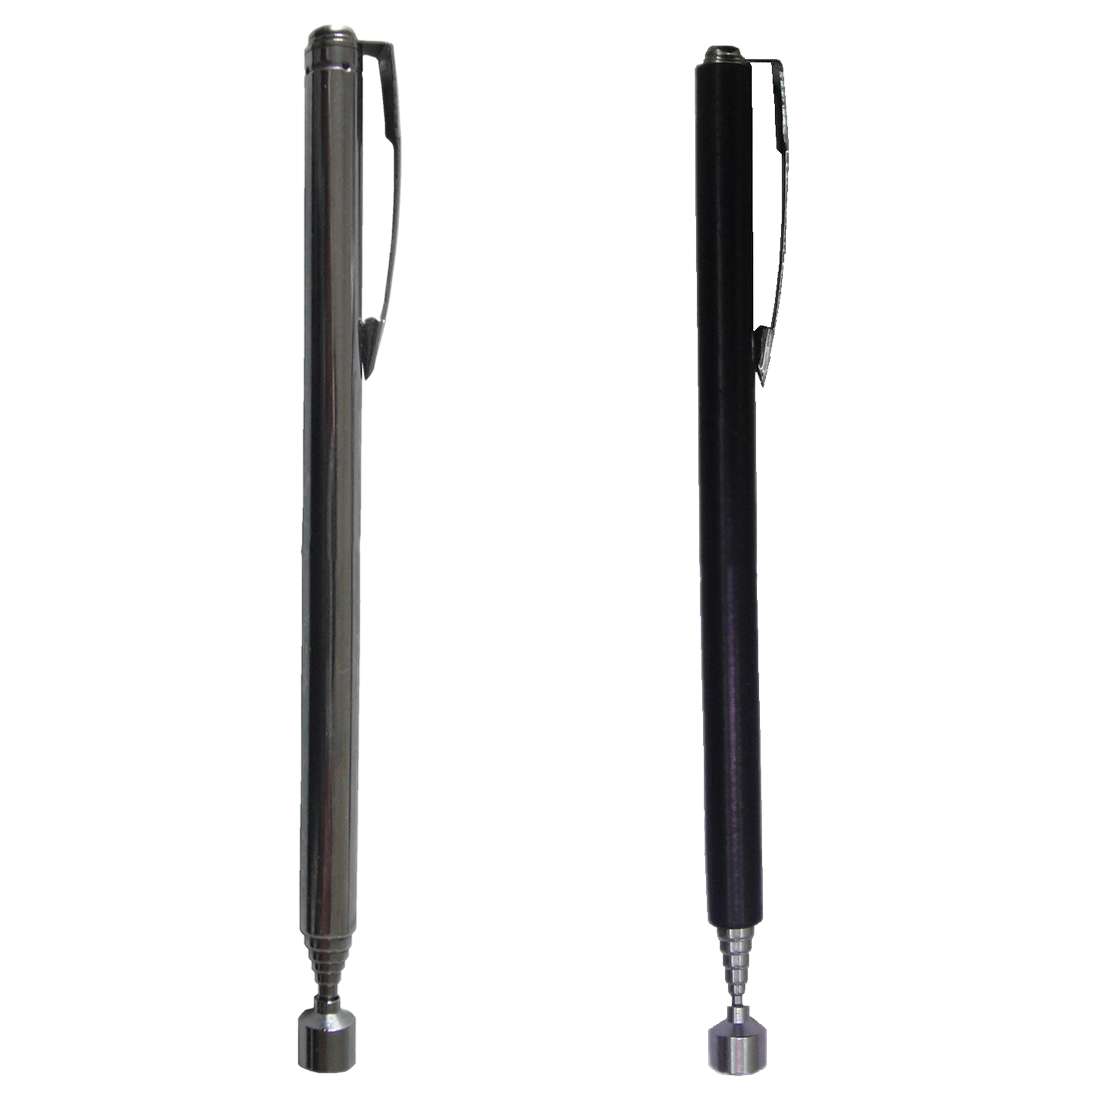 Telescopic Portable Extending Magnetic Pick Up Tools Pen Rod Stick Handheld GS